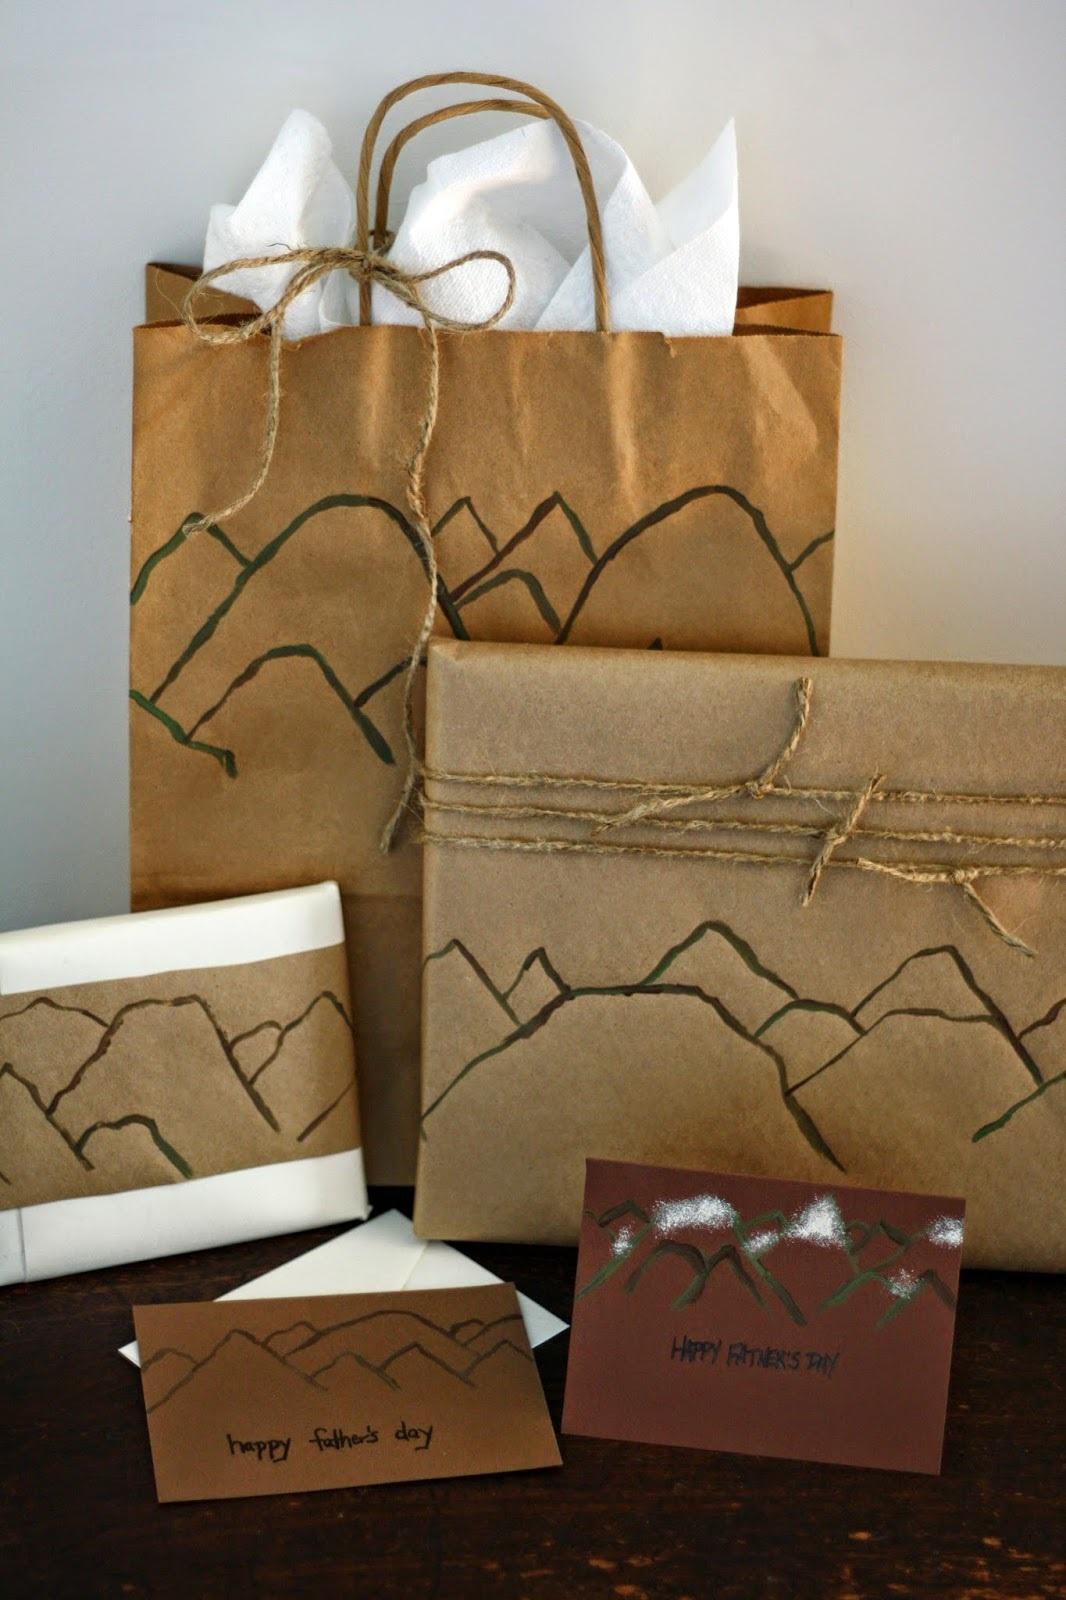 Diy painted mountain gift wrap